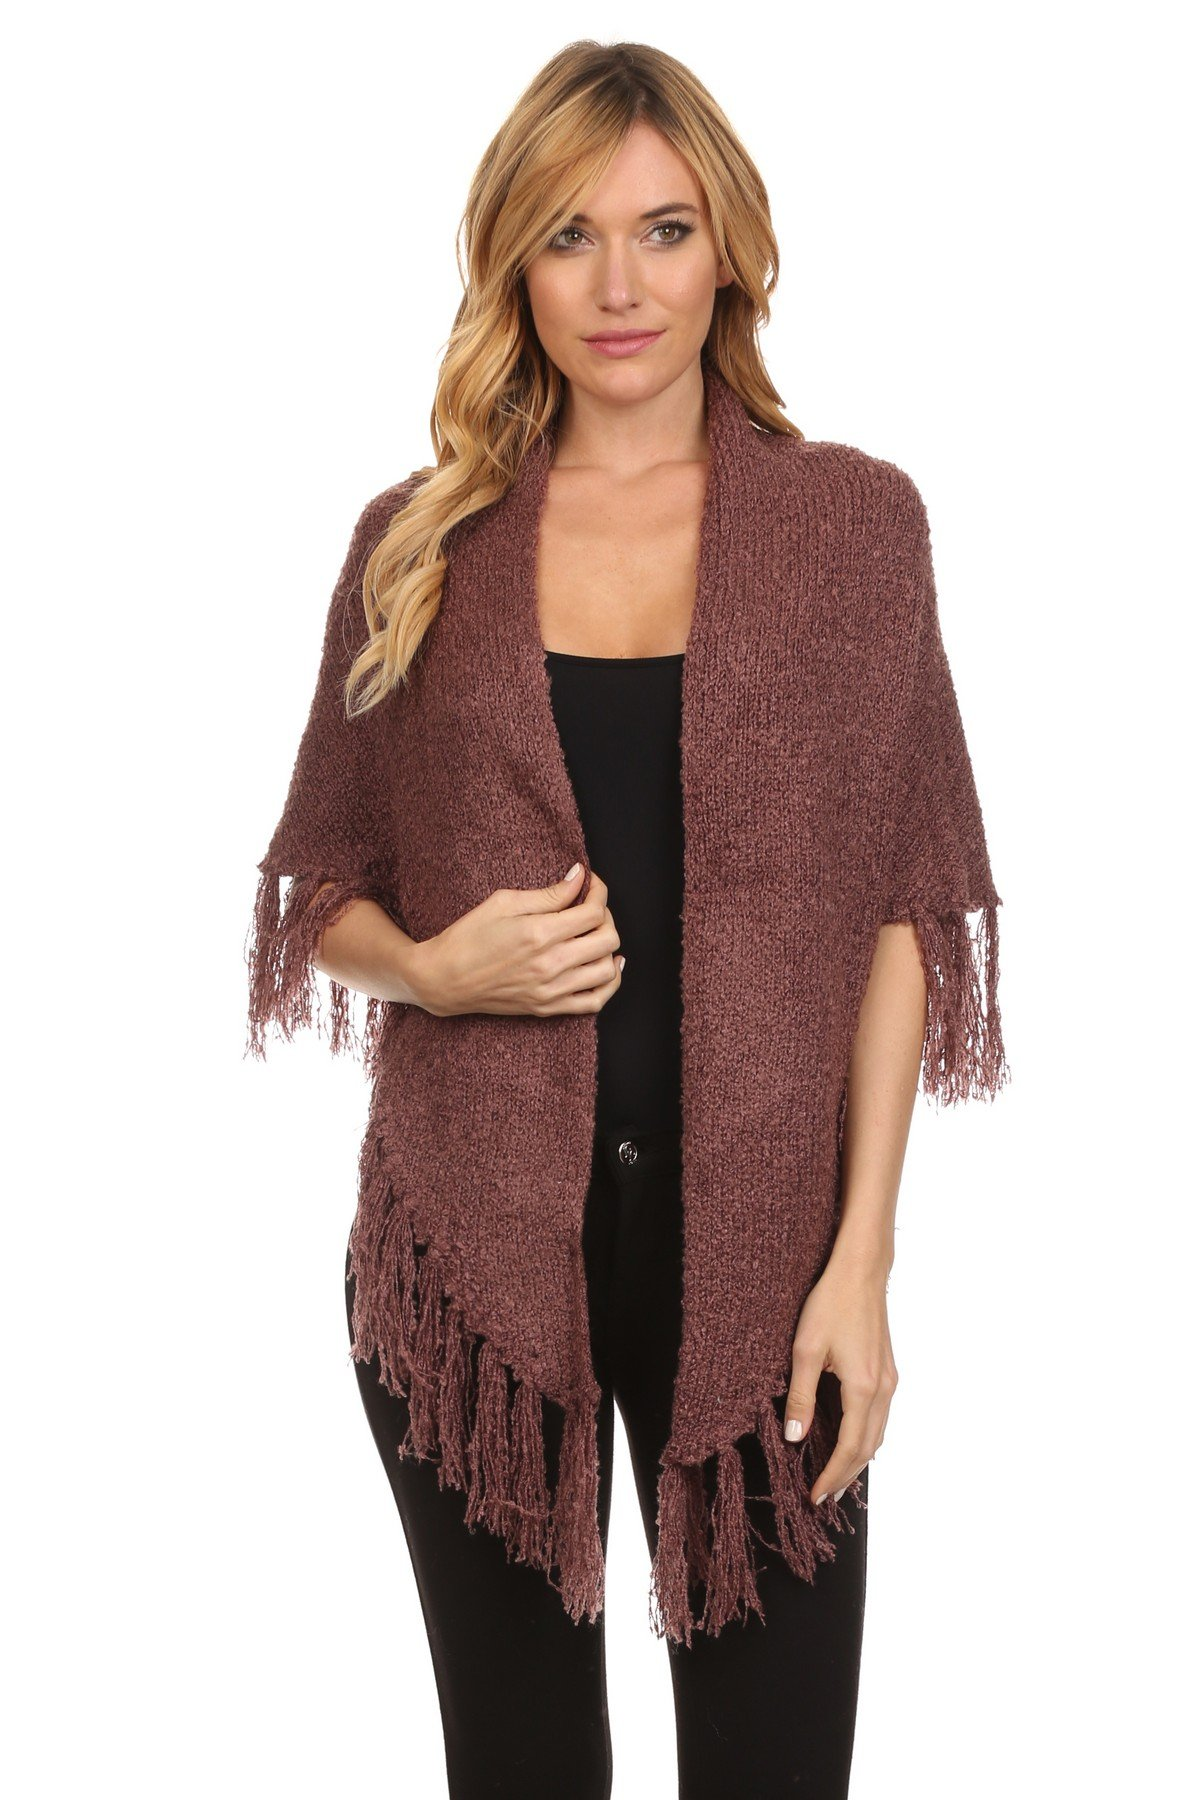 ICONOFLASH Women's Casual Sweater Knit Fringed Fashion Scarf Wrap, Mauve by ICONOFLASH (Image #2)